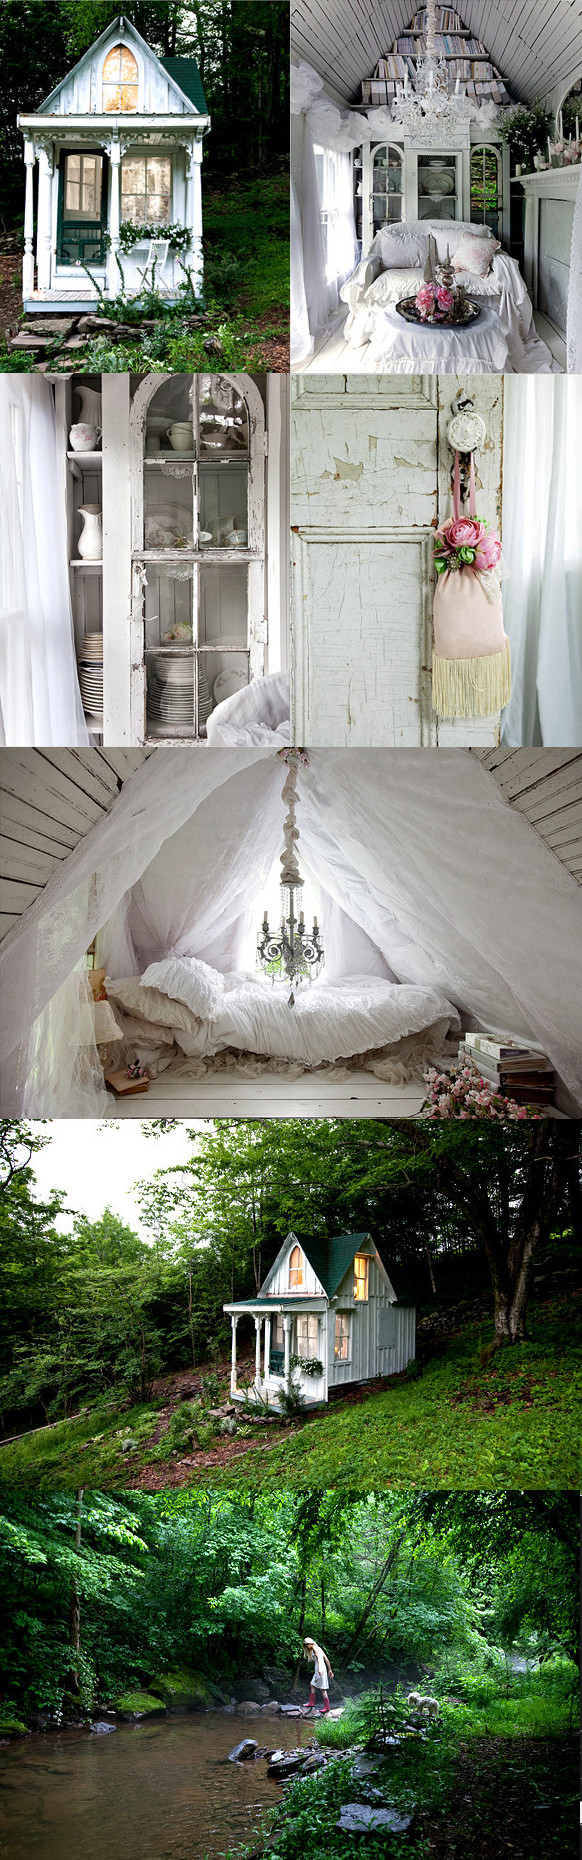 Personal Hideway; an old Victorian cottage. - Imgur